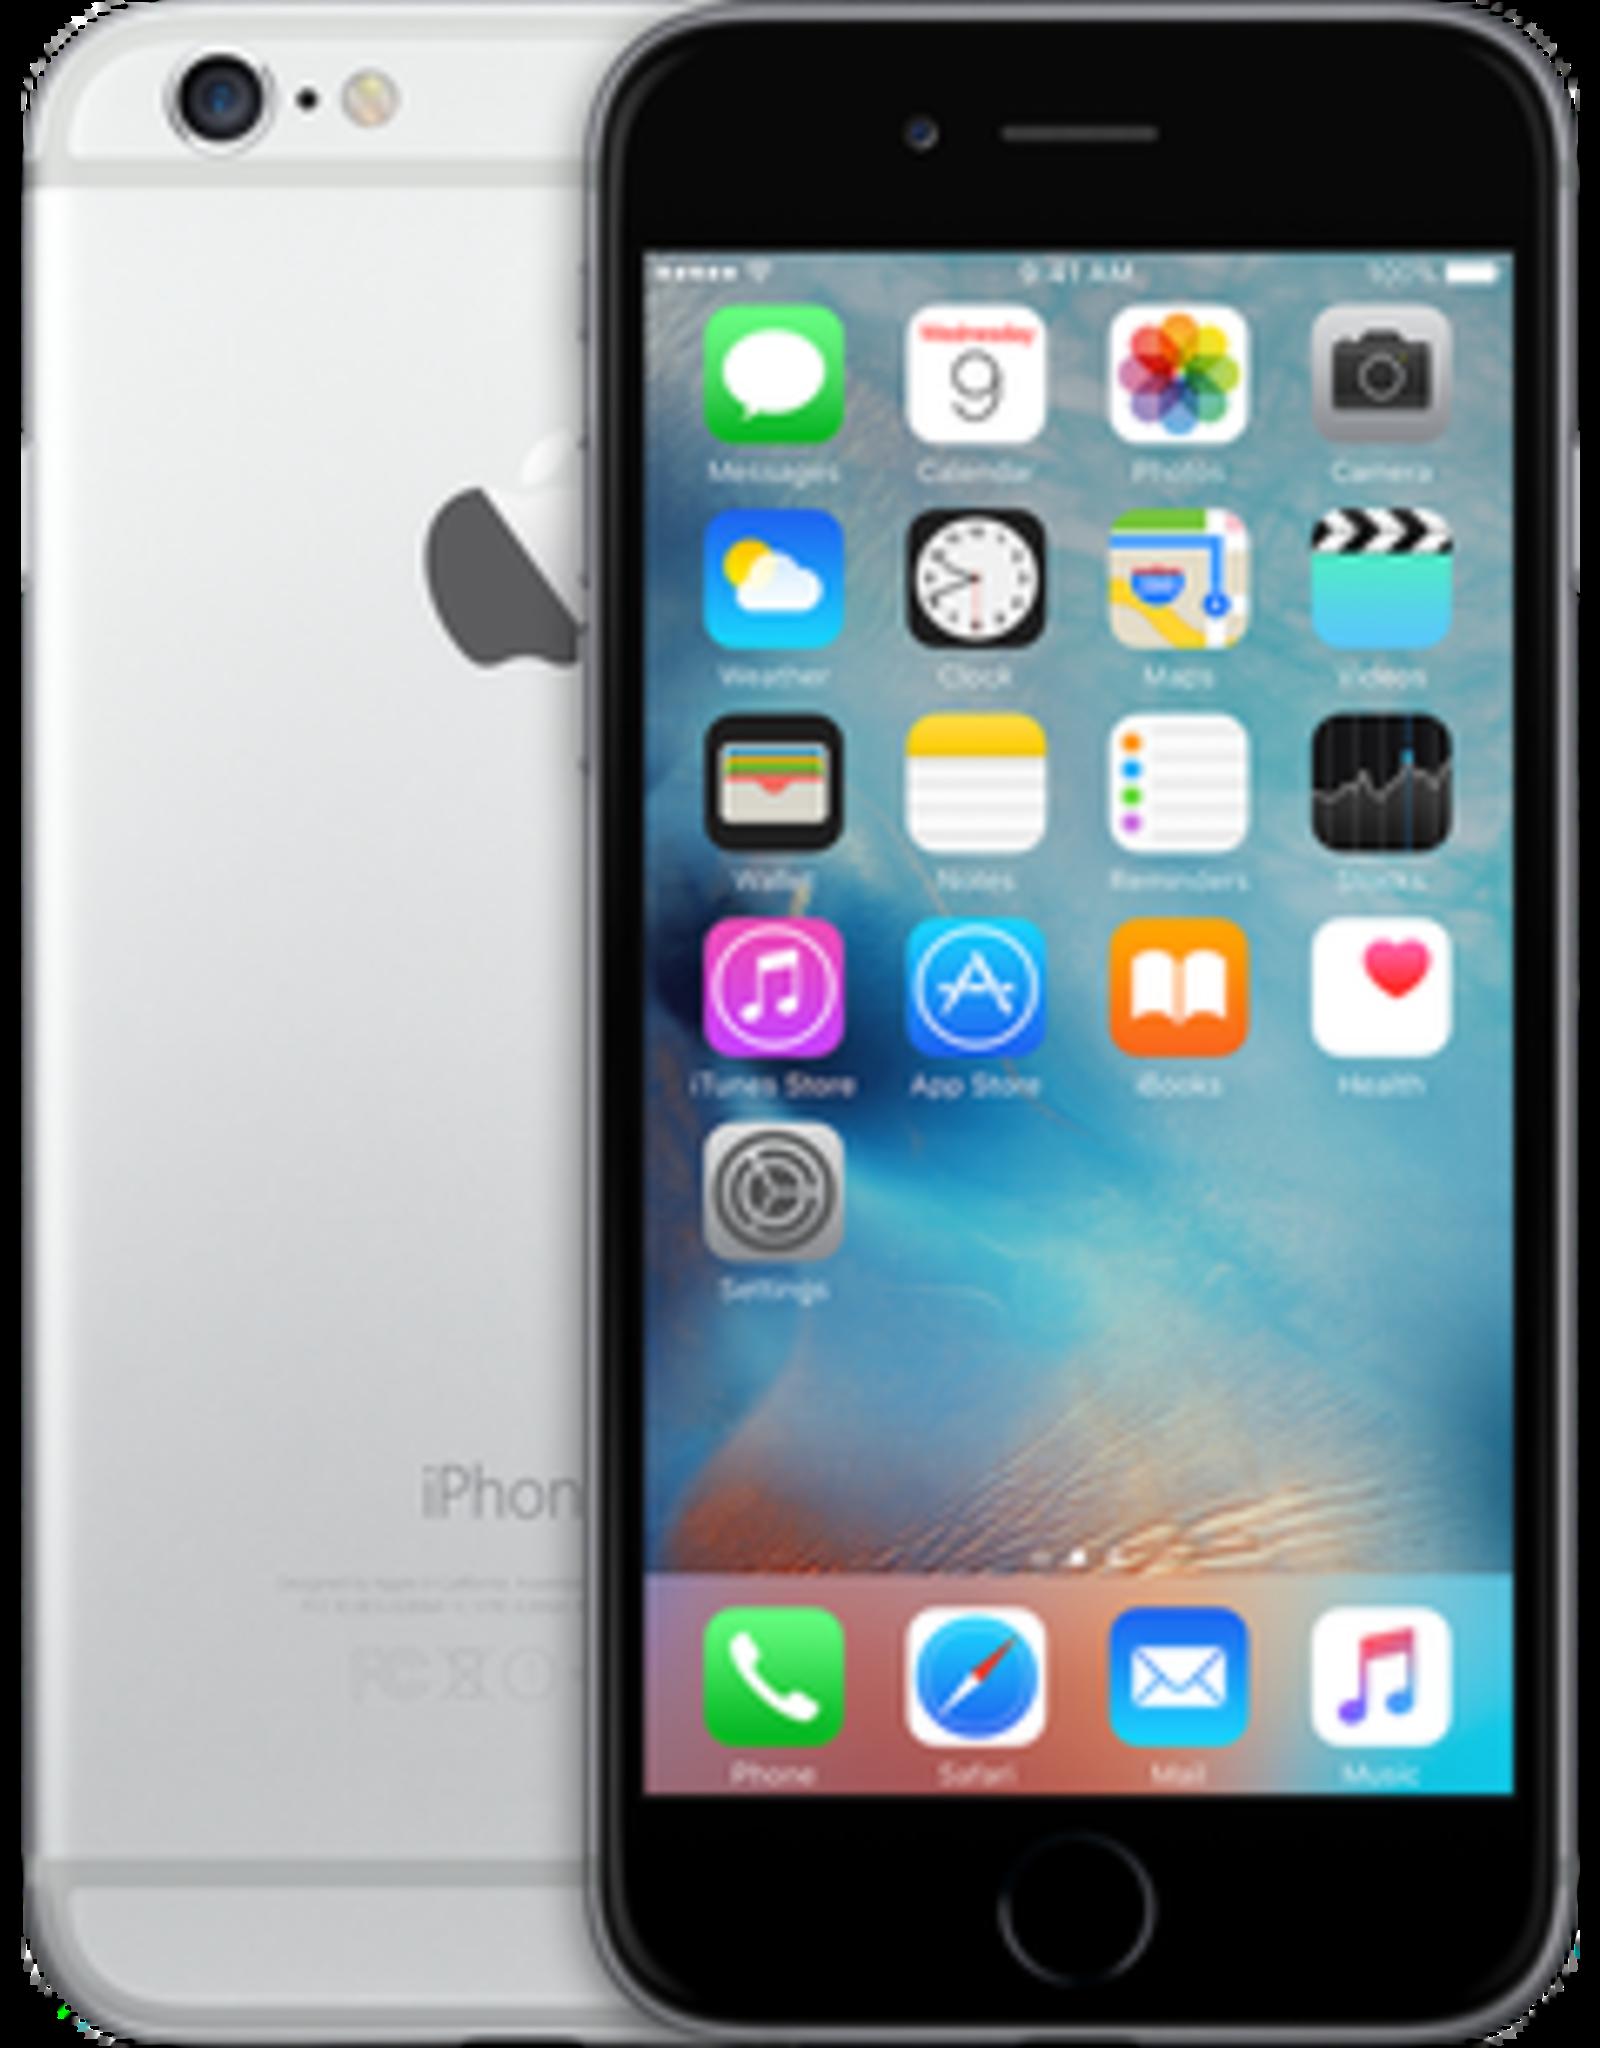 Apple iPhone 6 Plus (16GB, Gold) - 30 Day Exchange